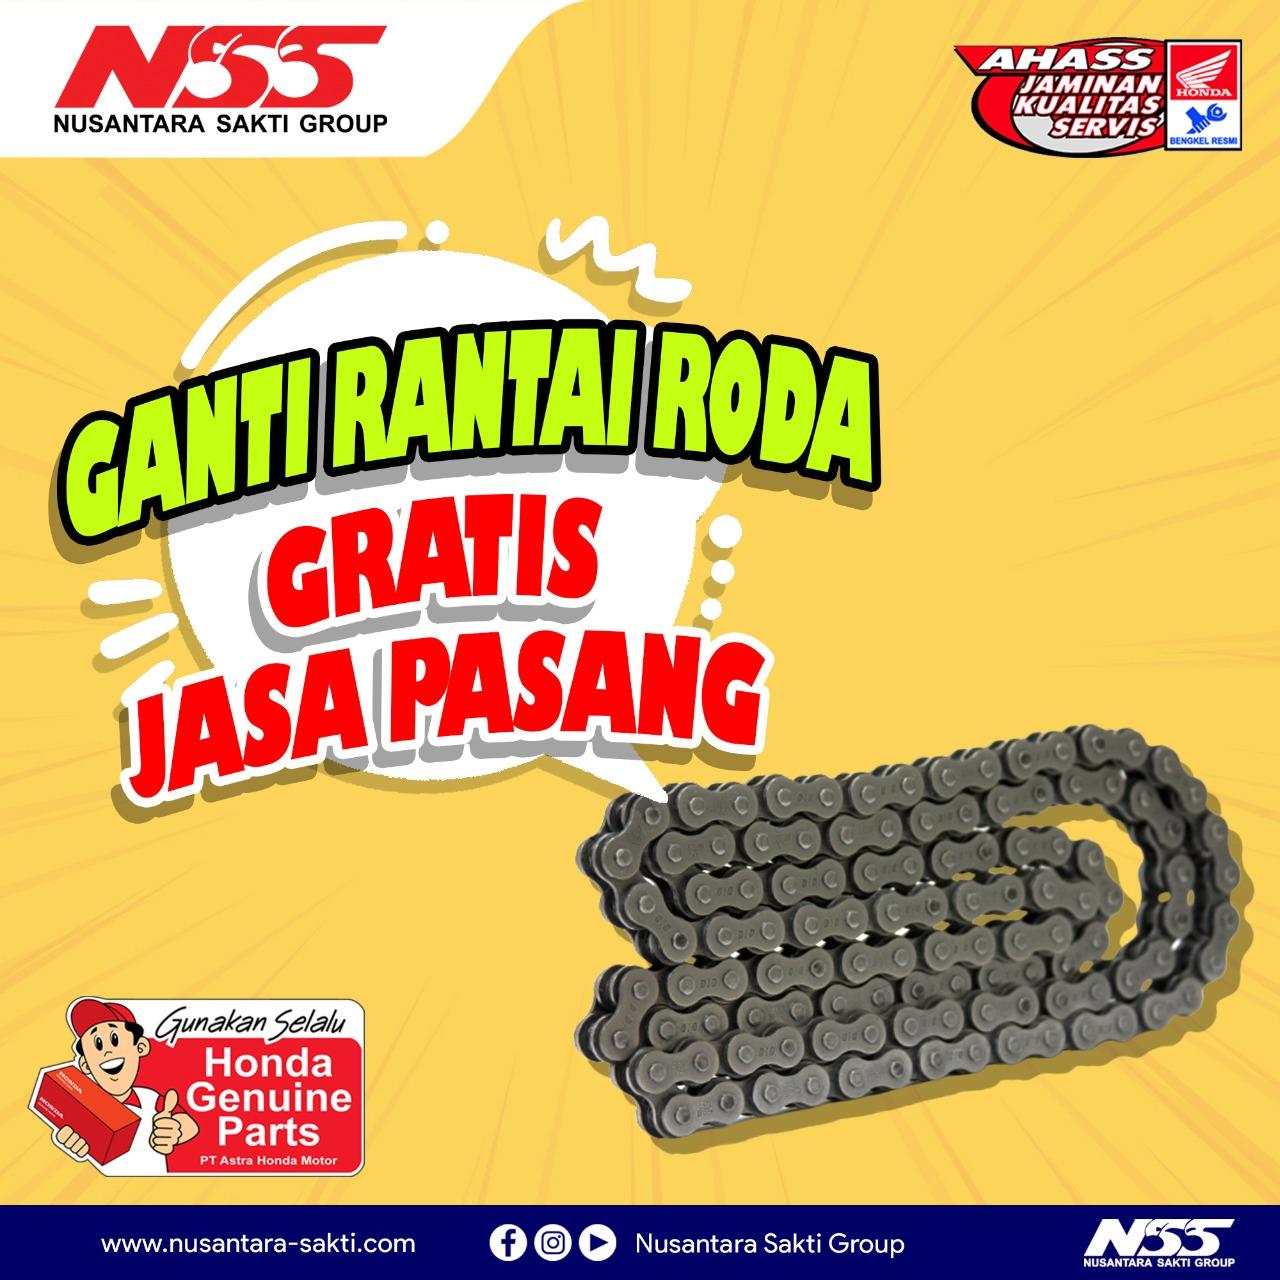 NSS Sungailiat - Promo ganti rantai roda gratis jasa pasang